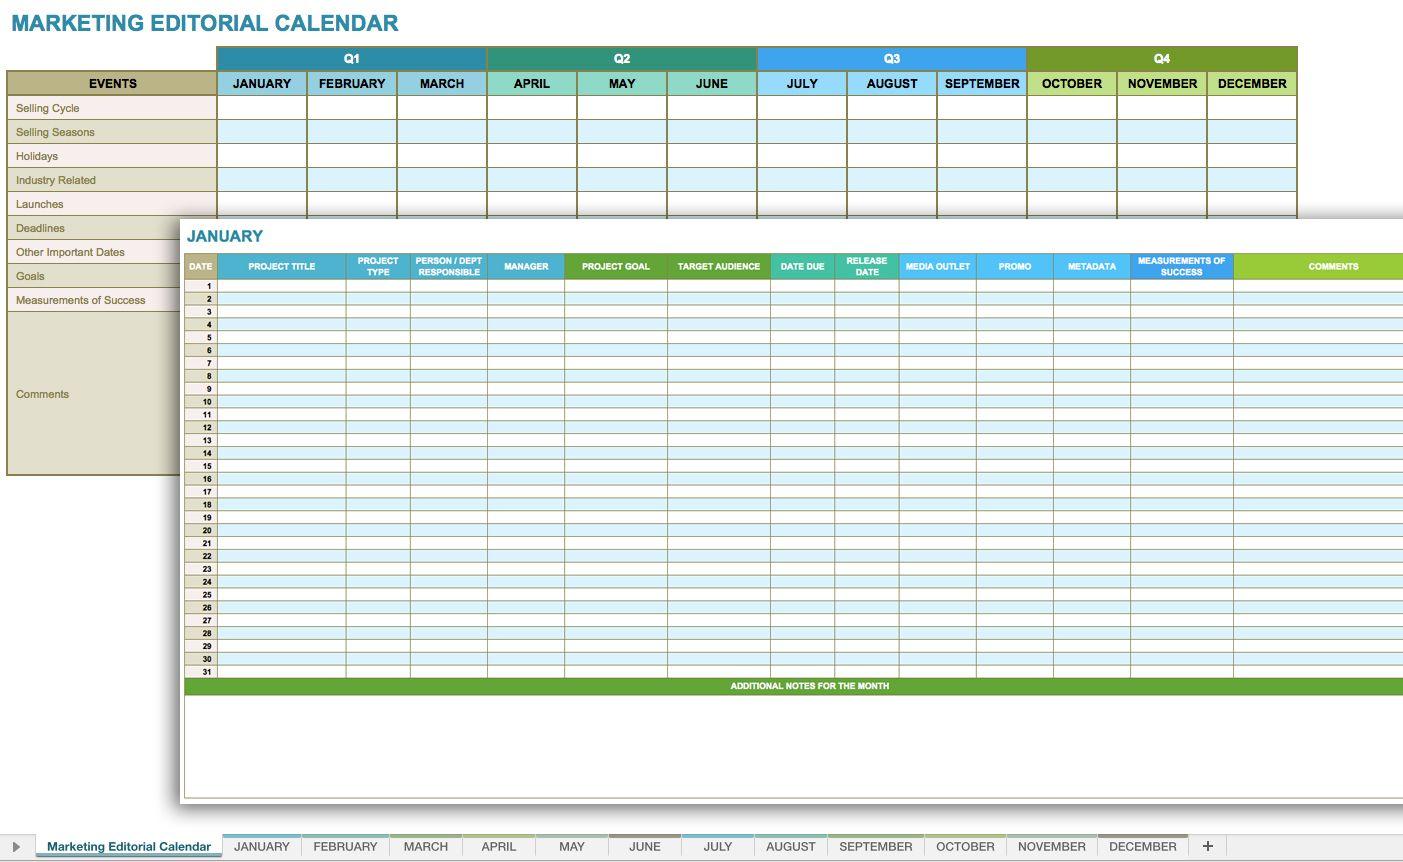 Free Social Media Planning Templates For Excel Via